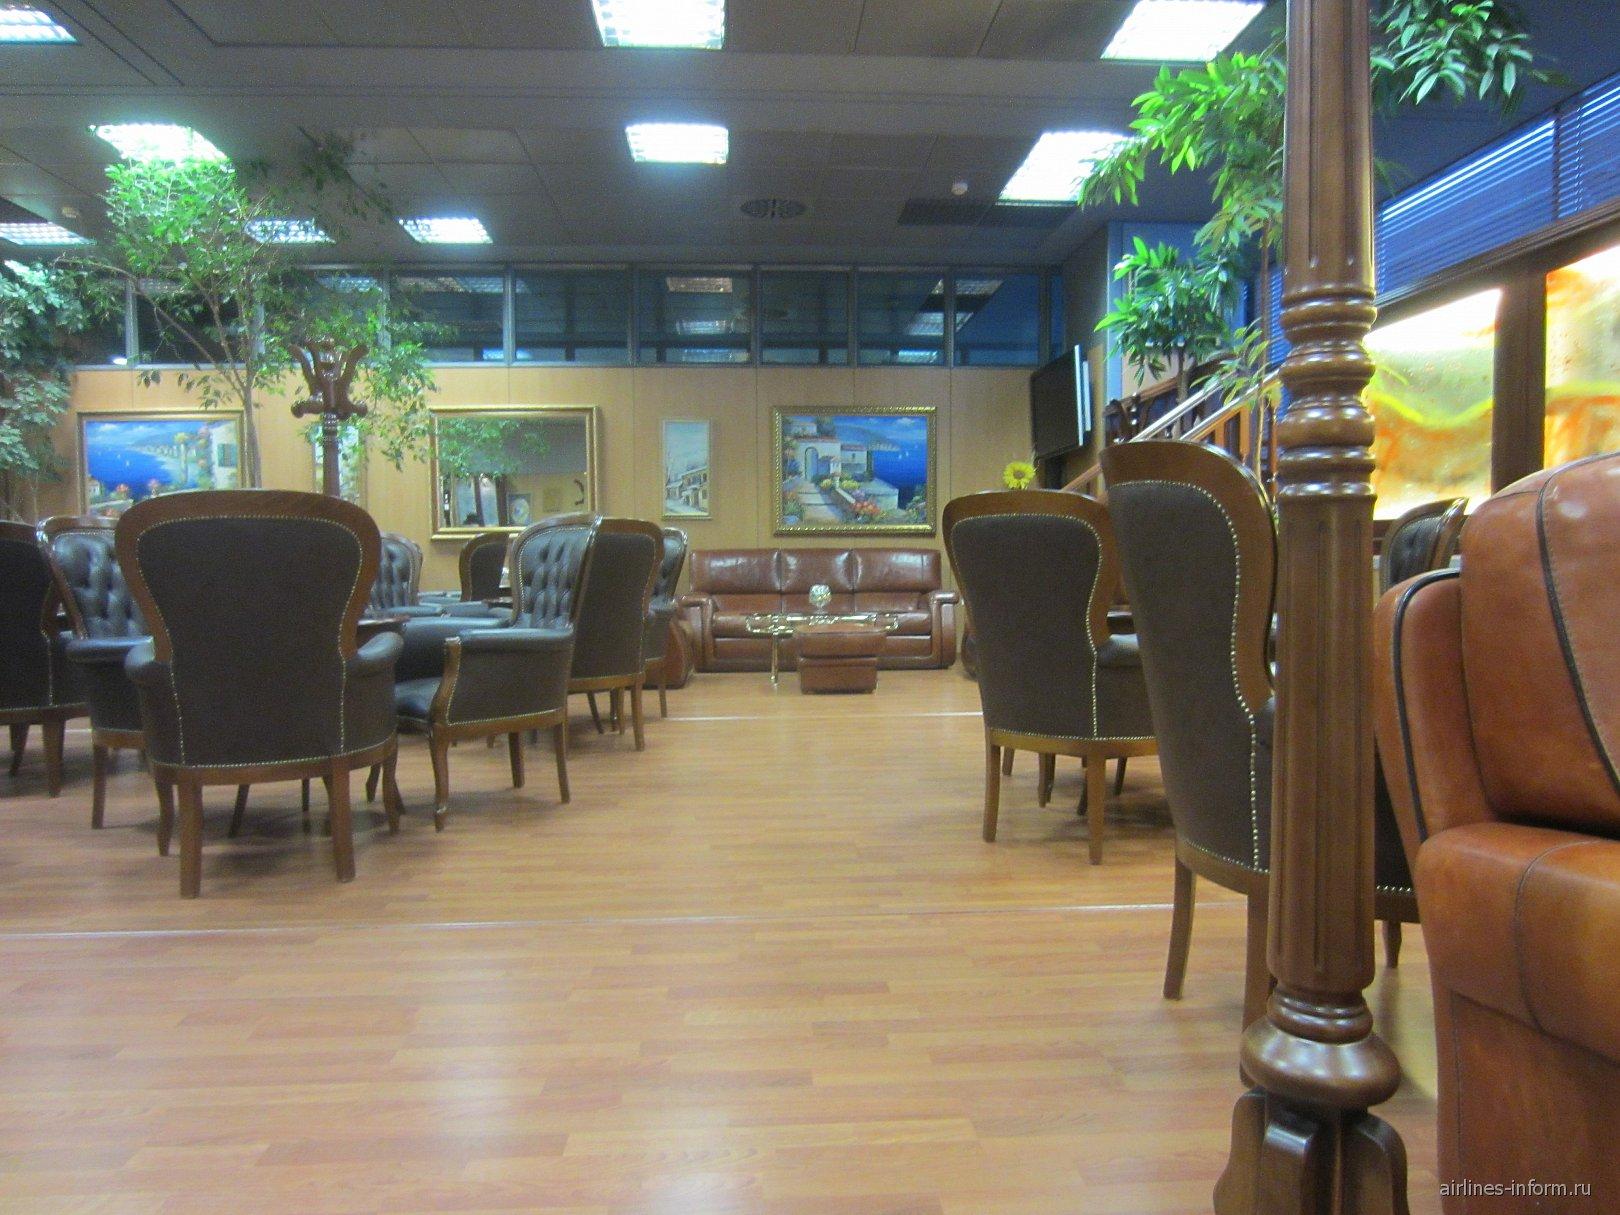 Бизнес-зал аэропорта Салоники